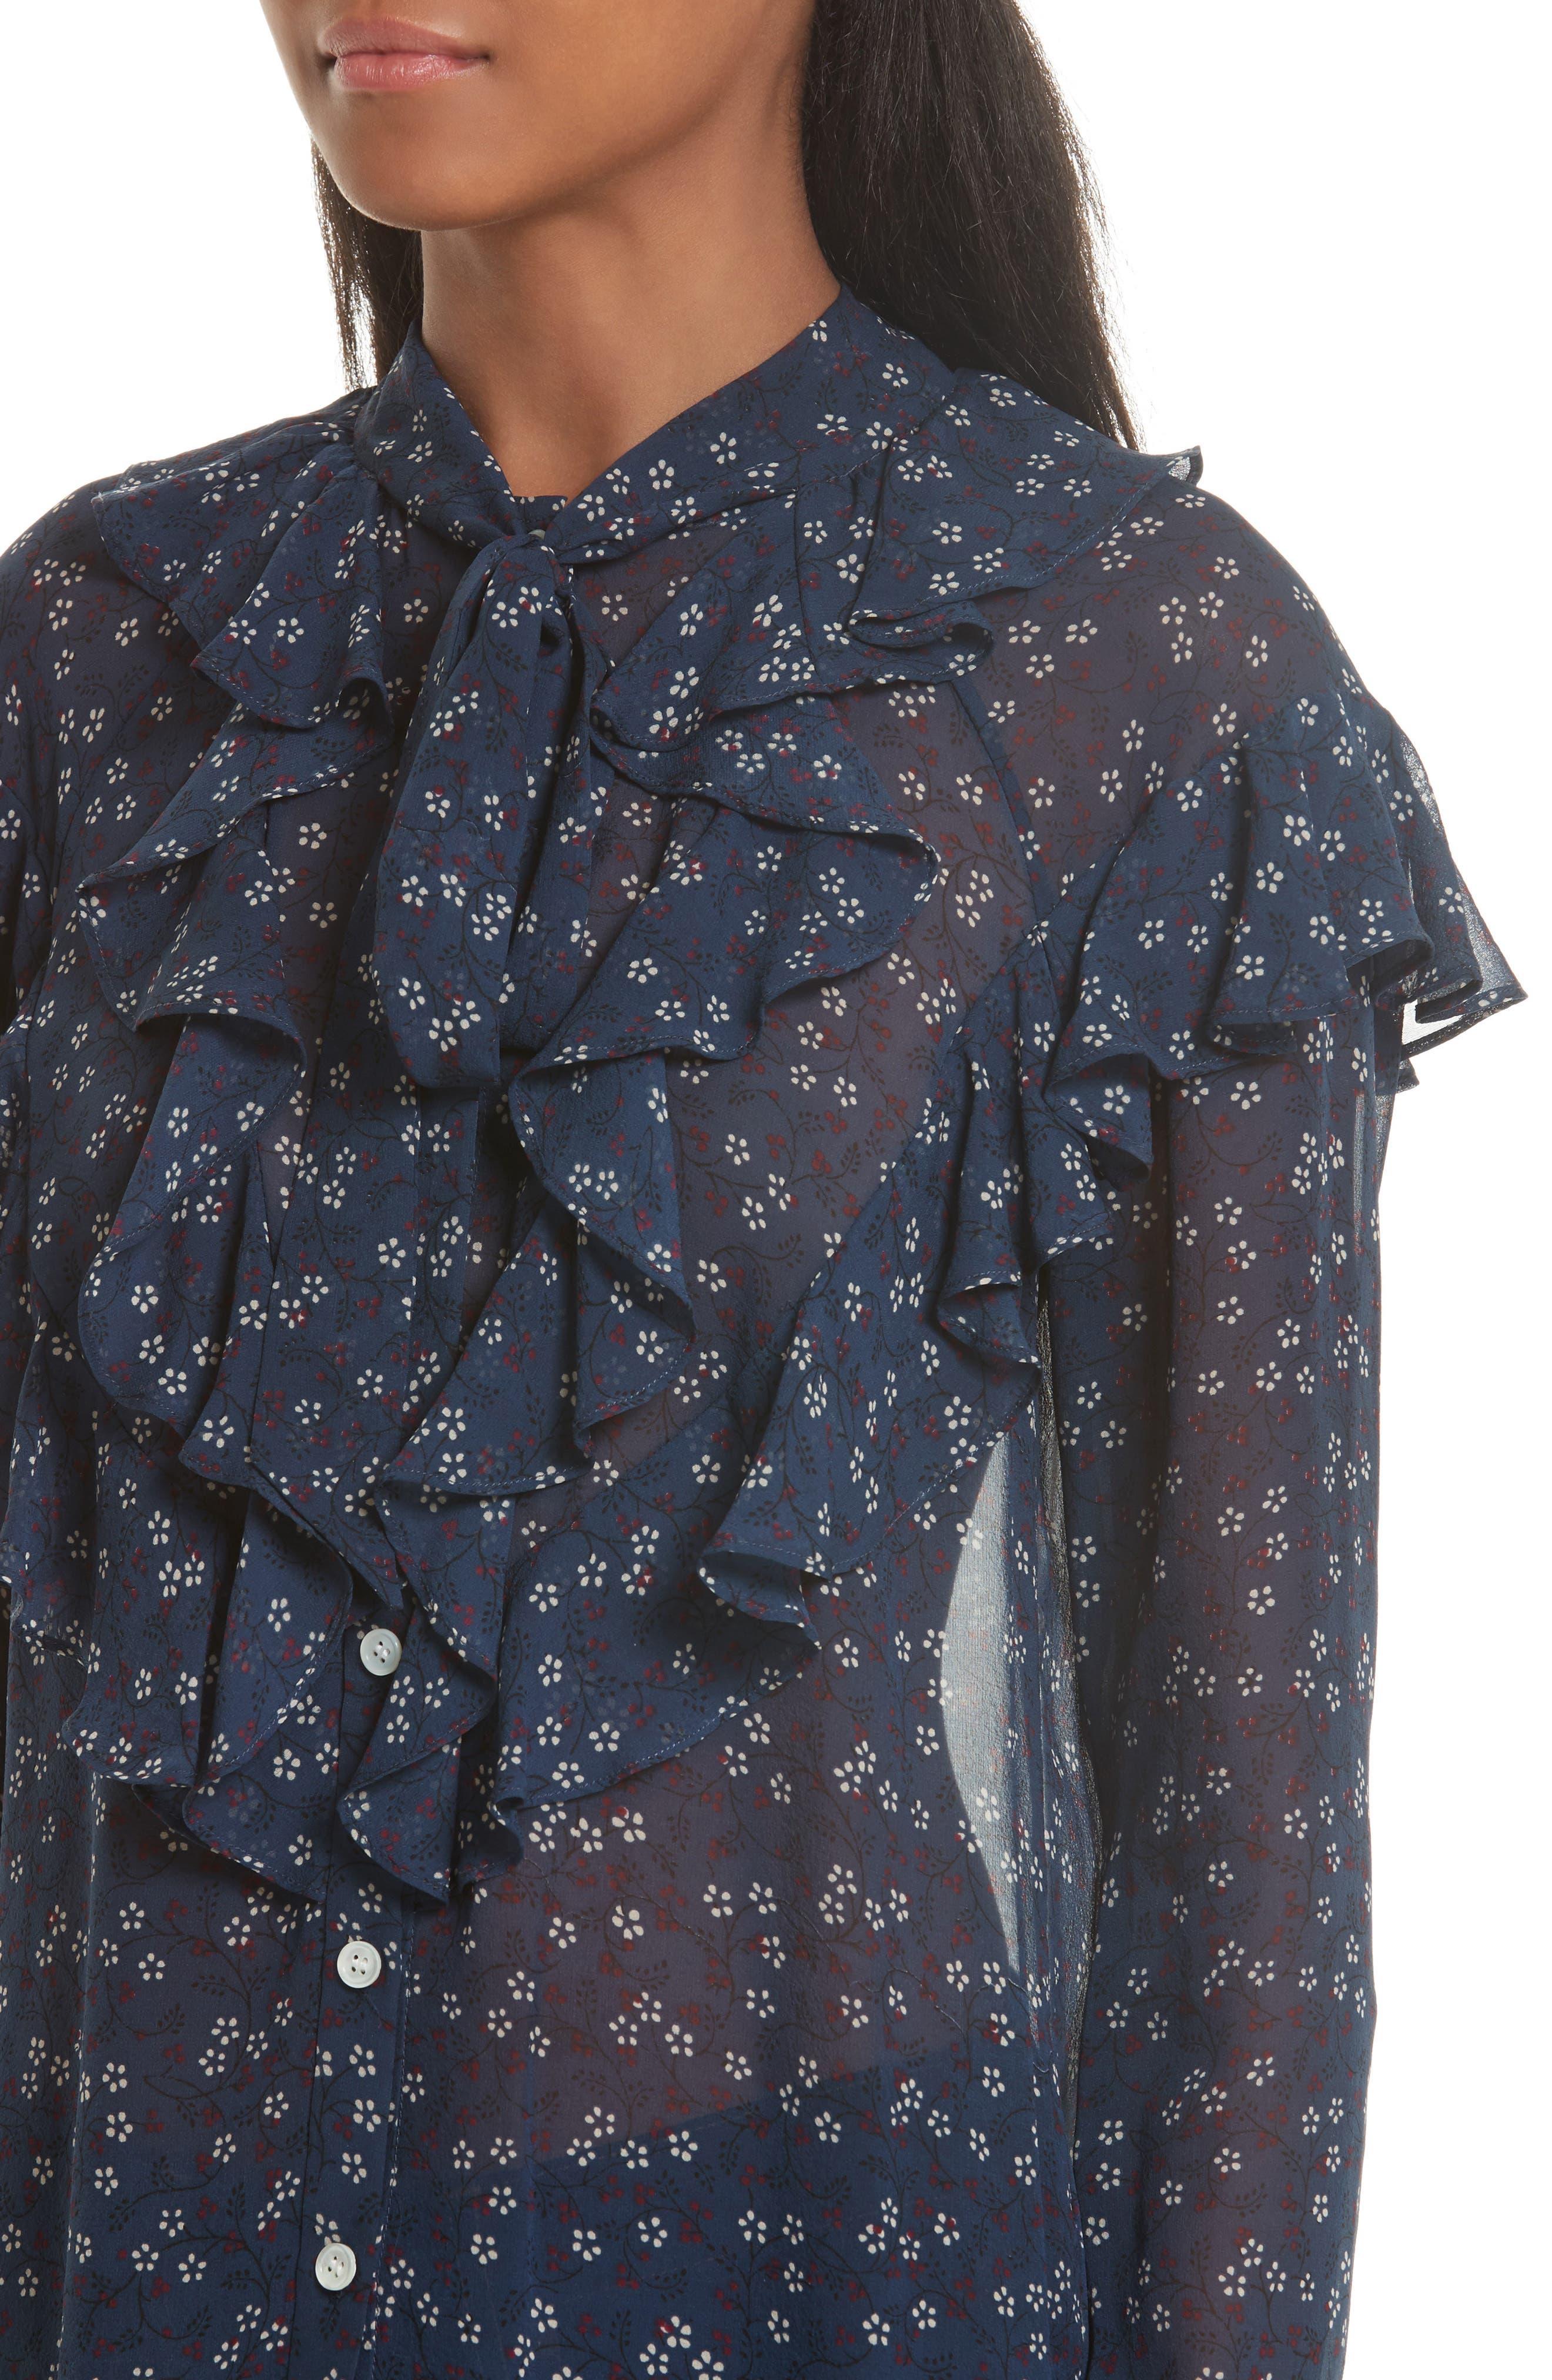 Finley Ruffle Tie Silk Top,                             Alternate thumbnail 4, color,                             410